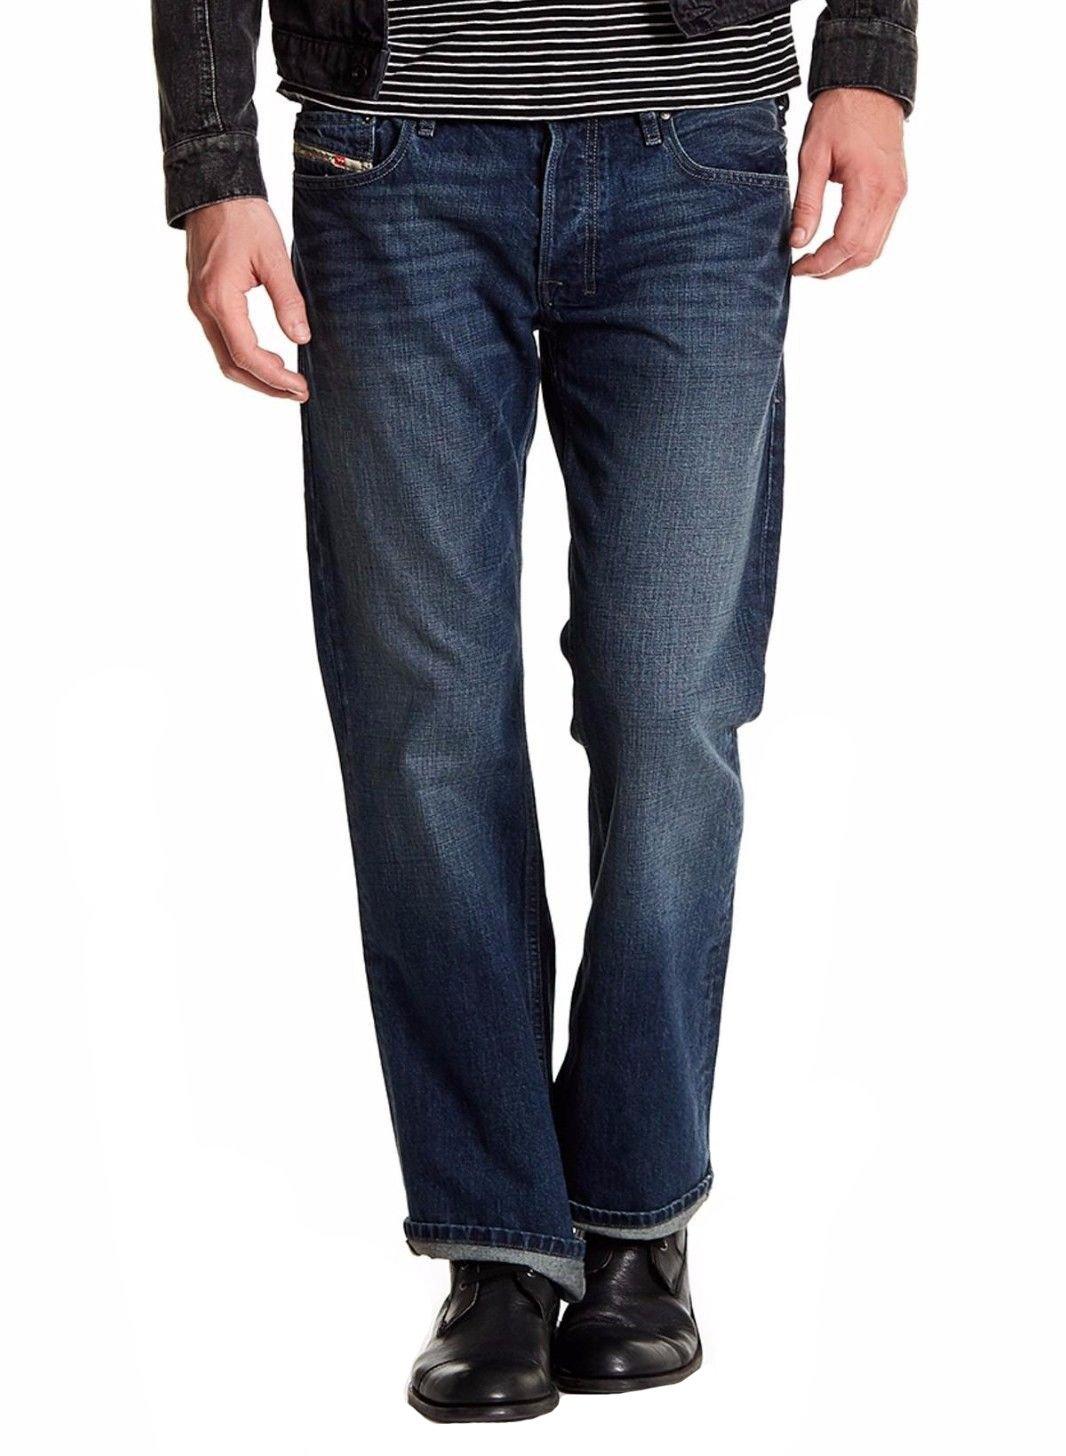 Diesel Mens Zatiny Regular Fit Bootcut Denim Jeans - Made in USA (38W x 30L, Blue 0RZ65)